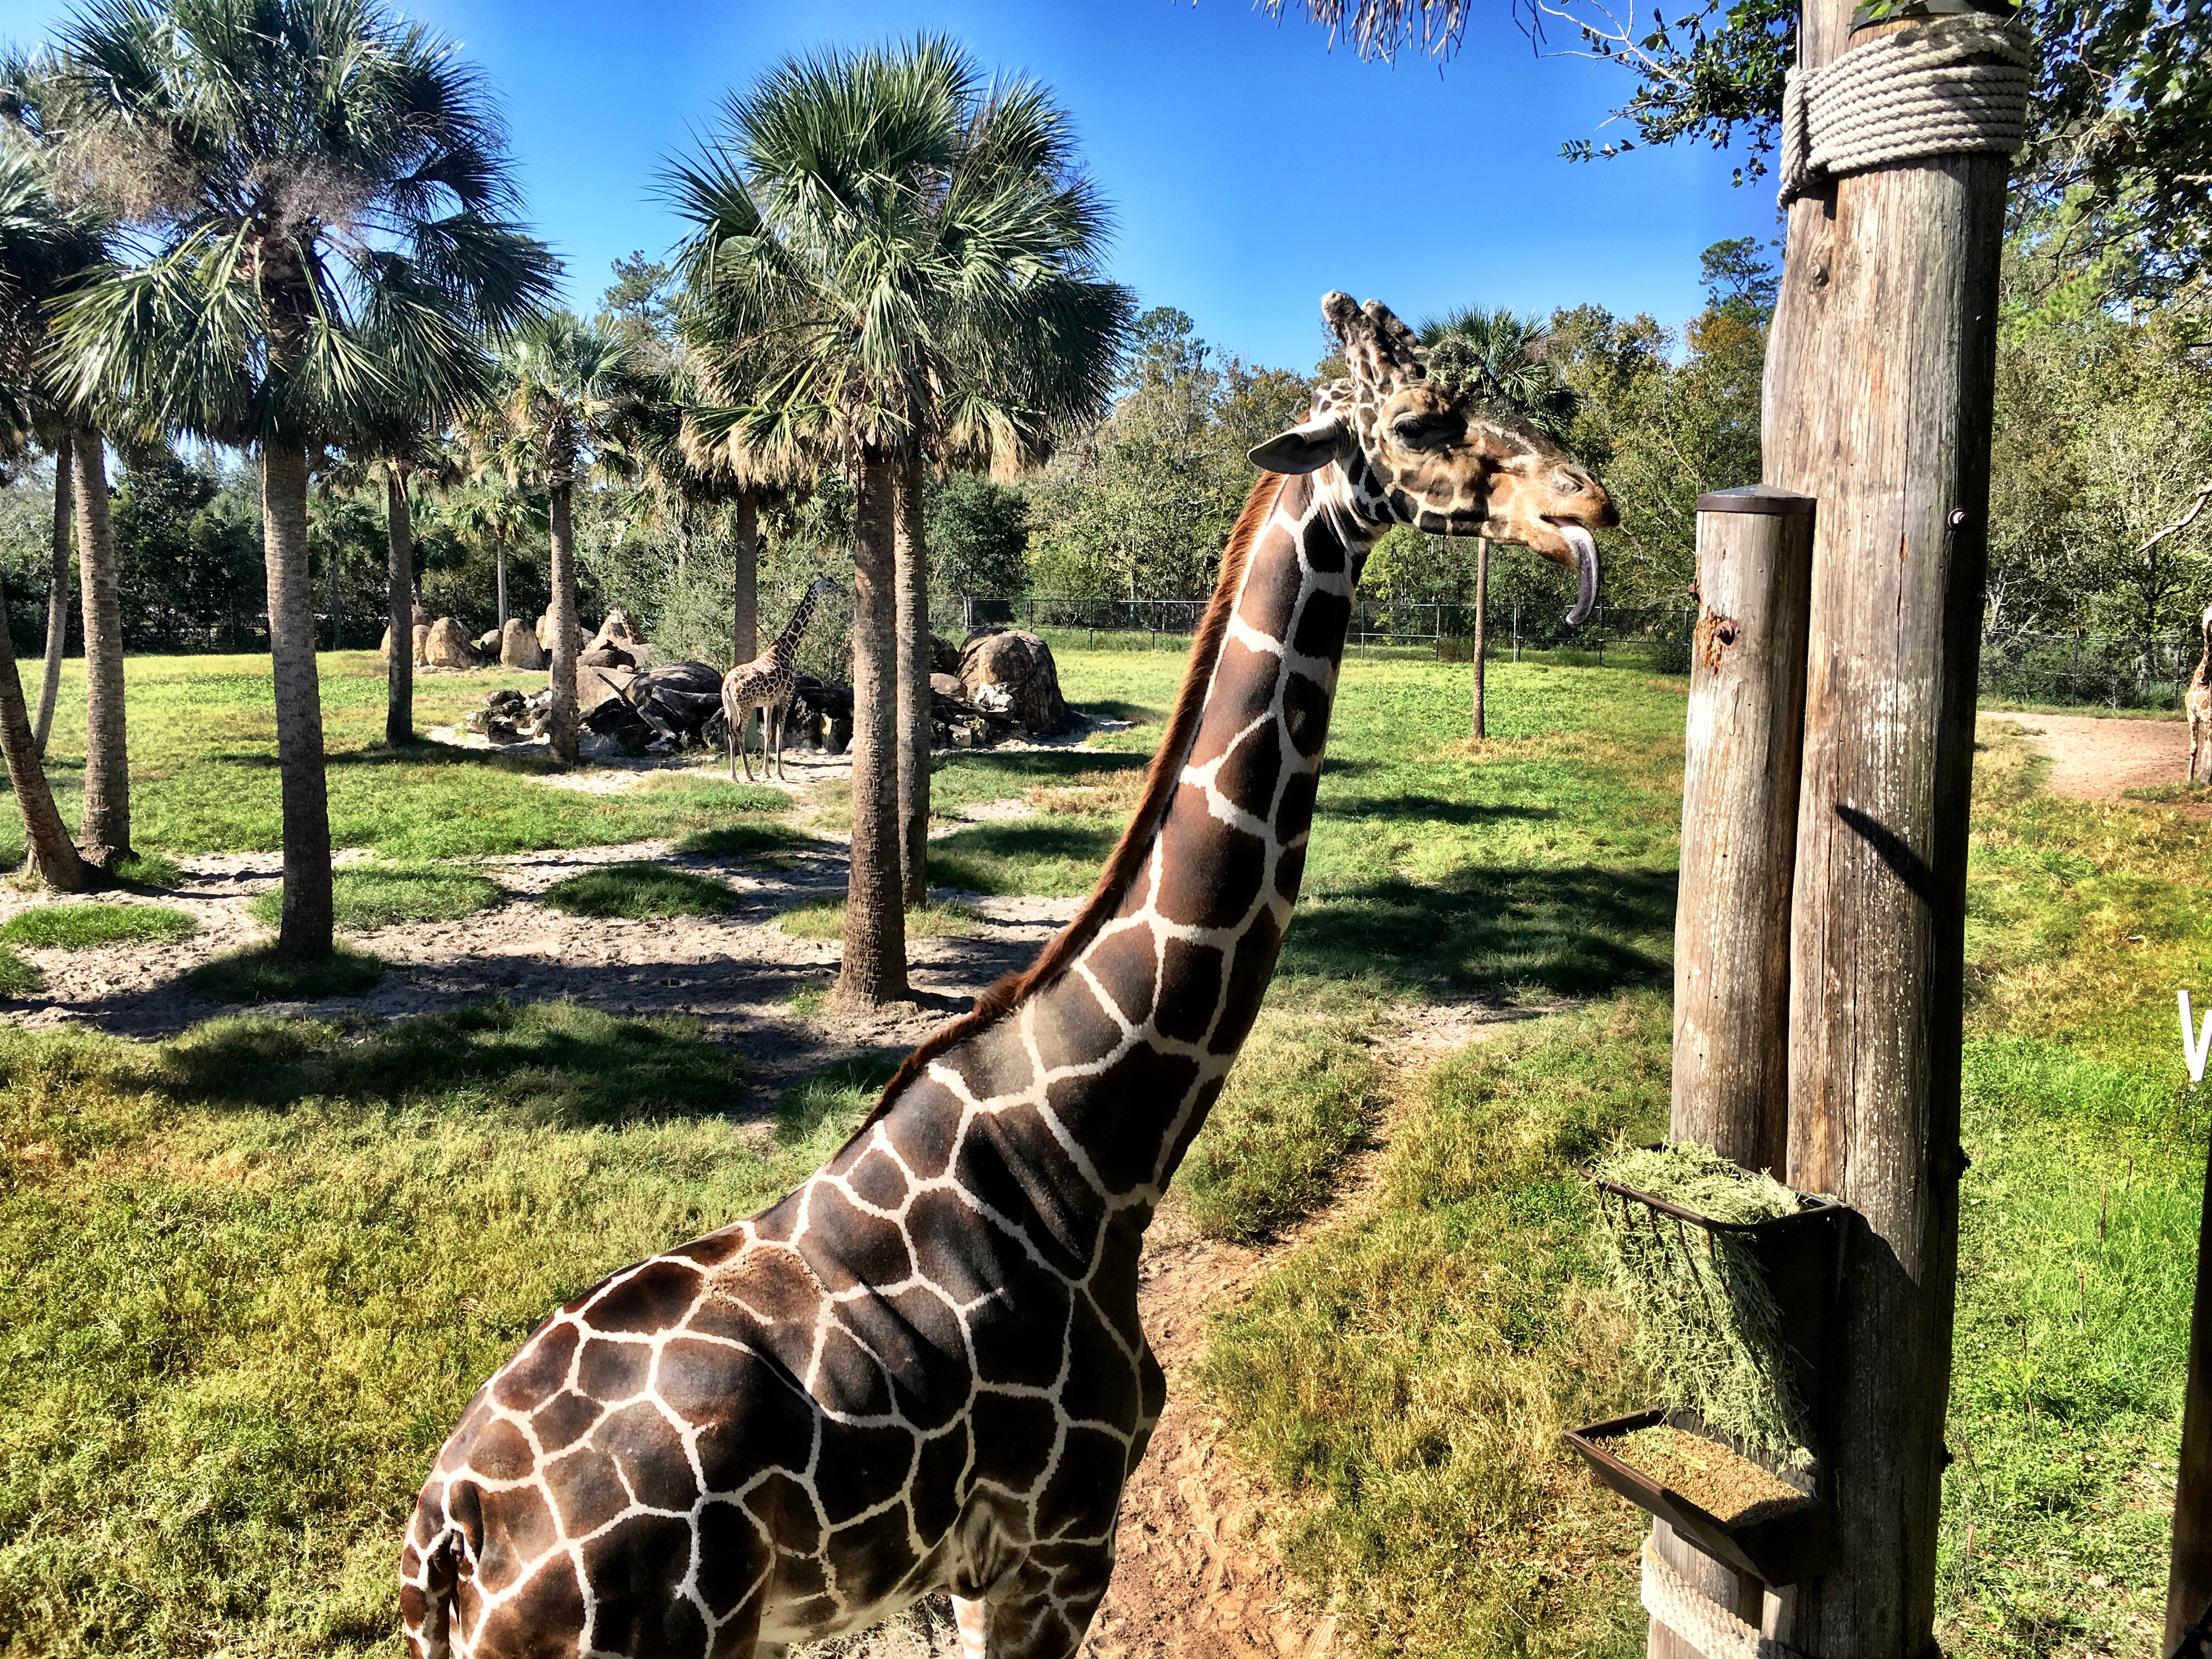 Jacksonville Zoo - Florida